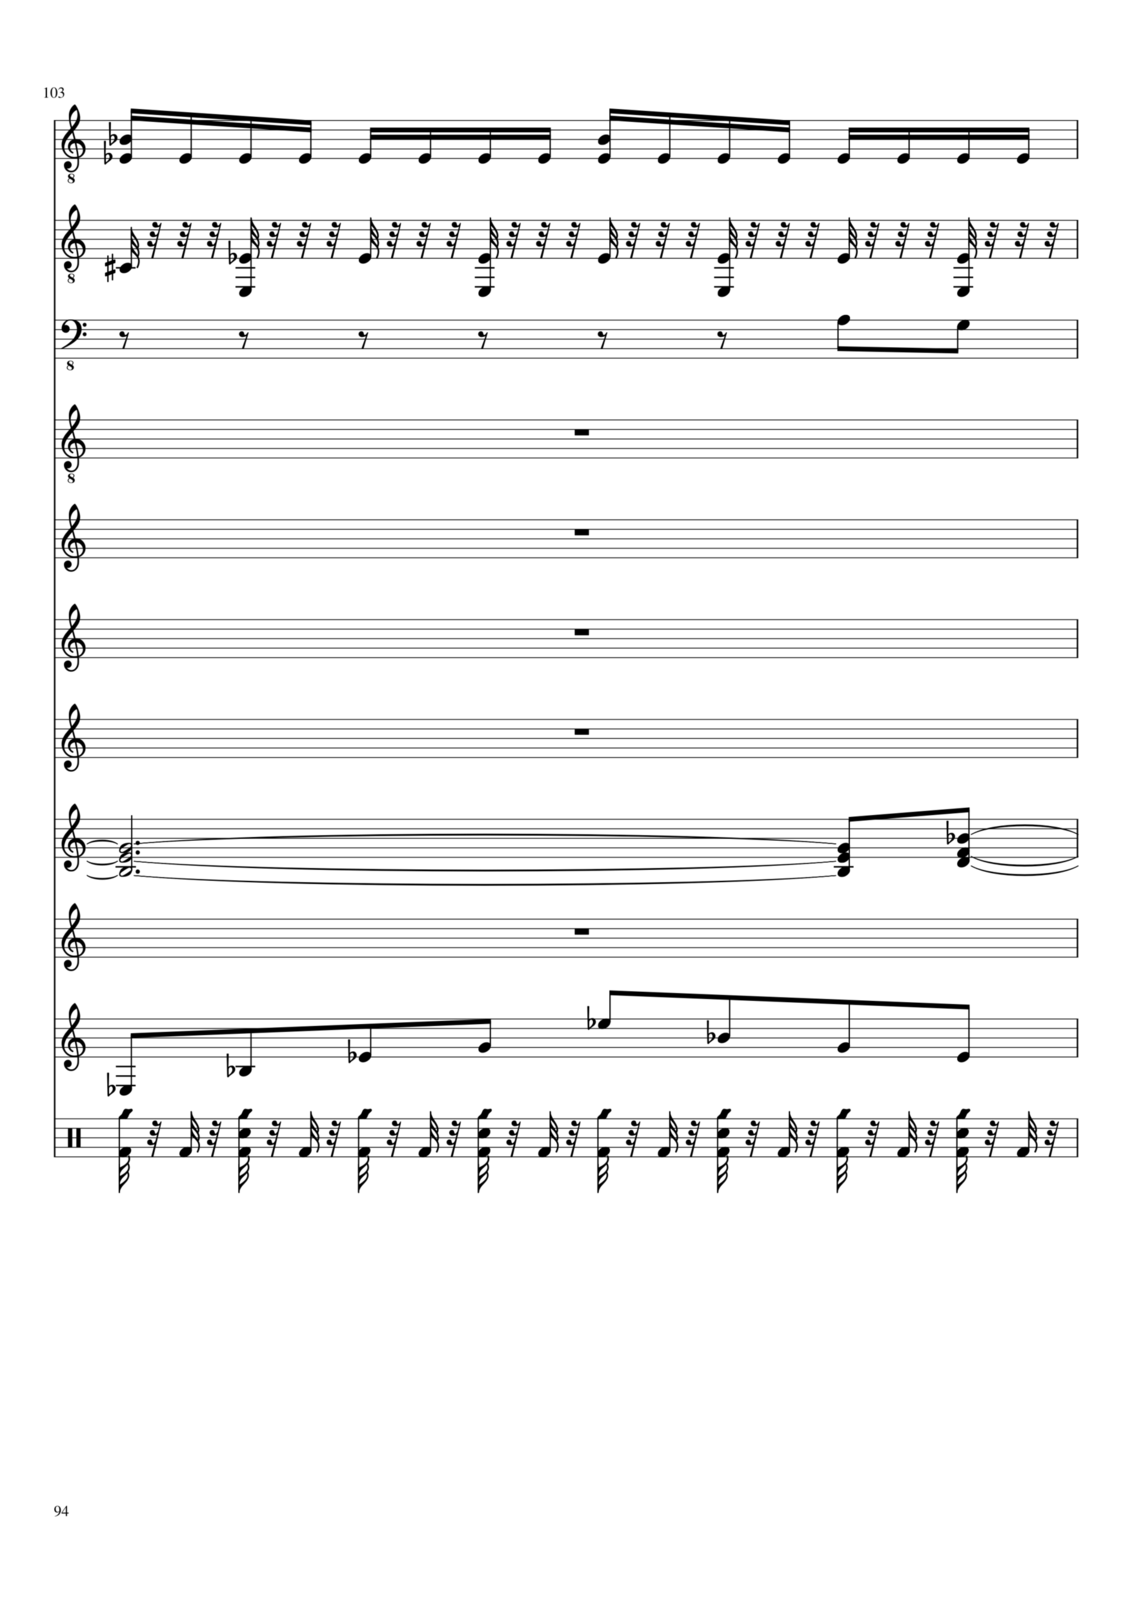 Belyiy sokol slide, Image 94